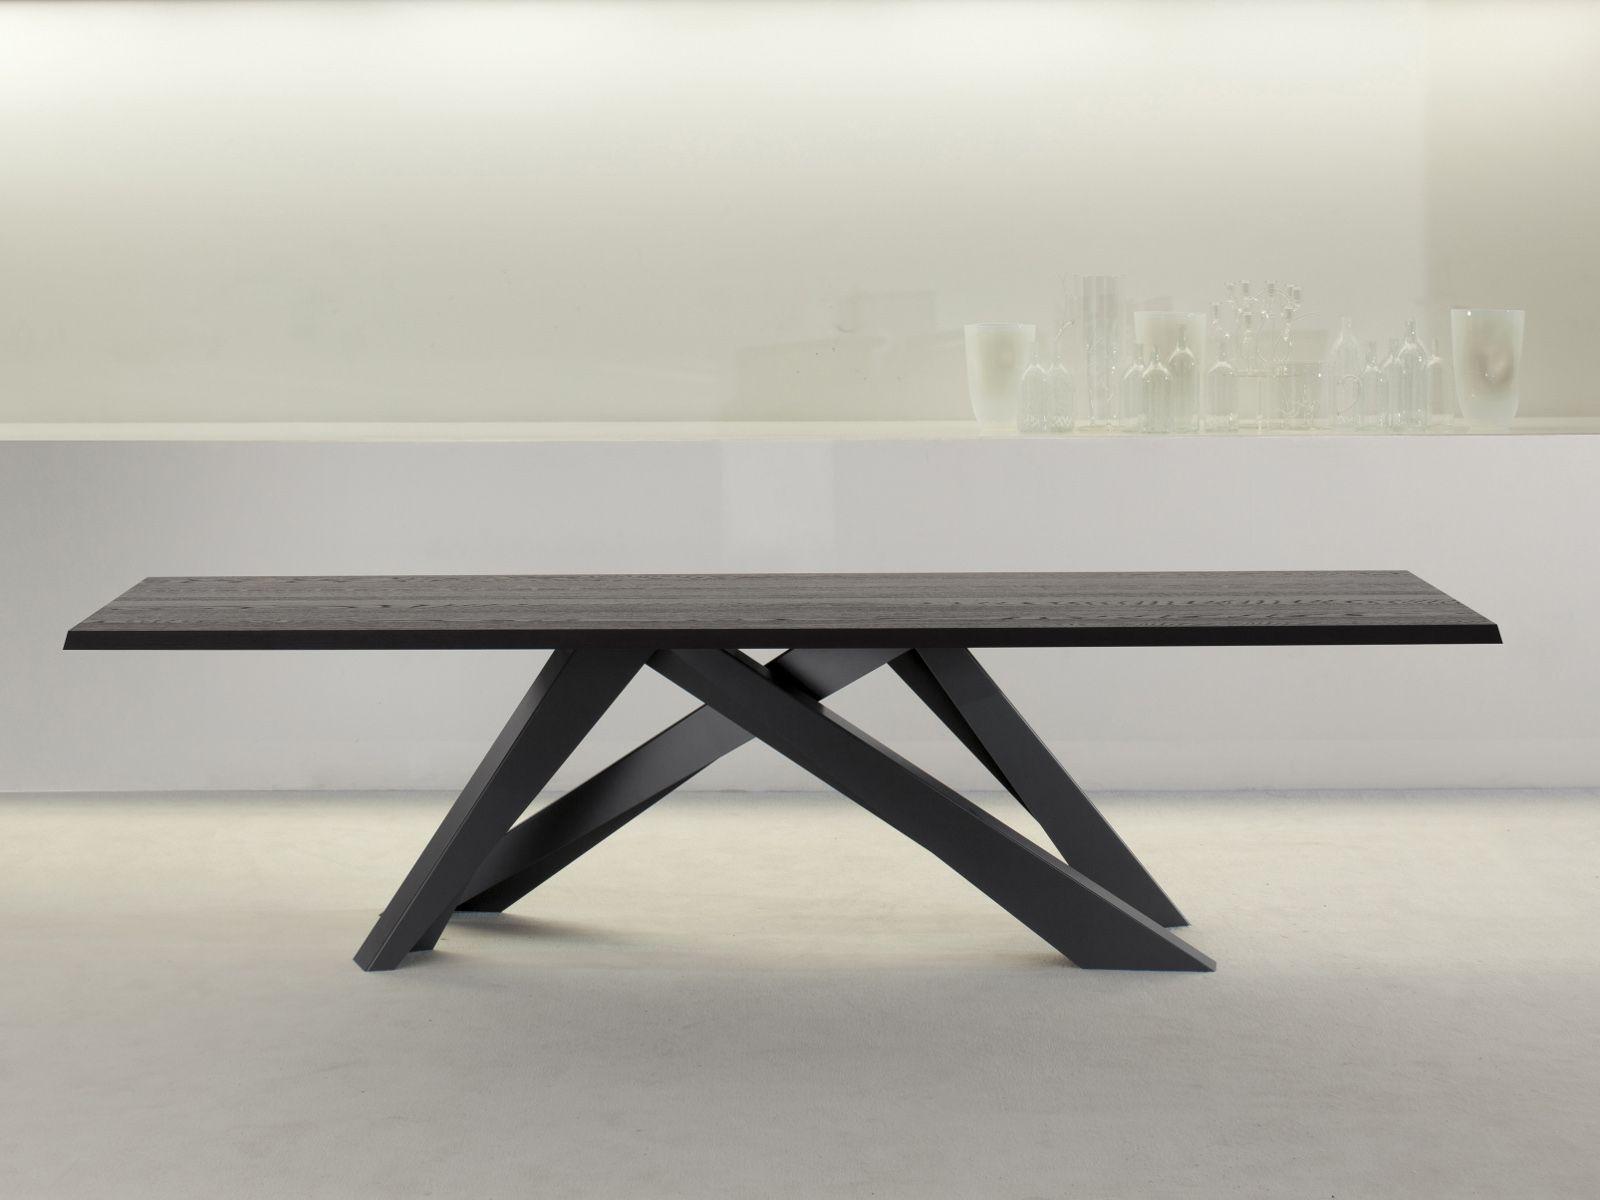 Tisch Modern rechteckiger tisch big table by bonaldo design alain gilles